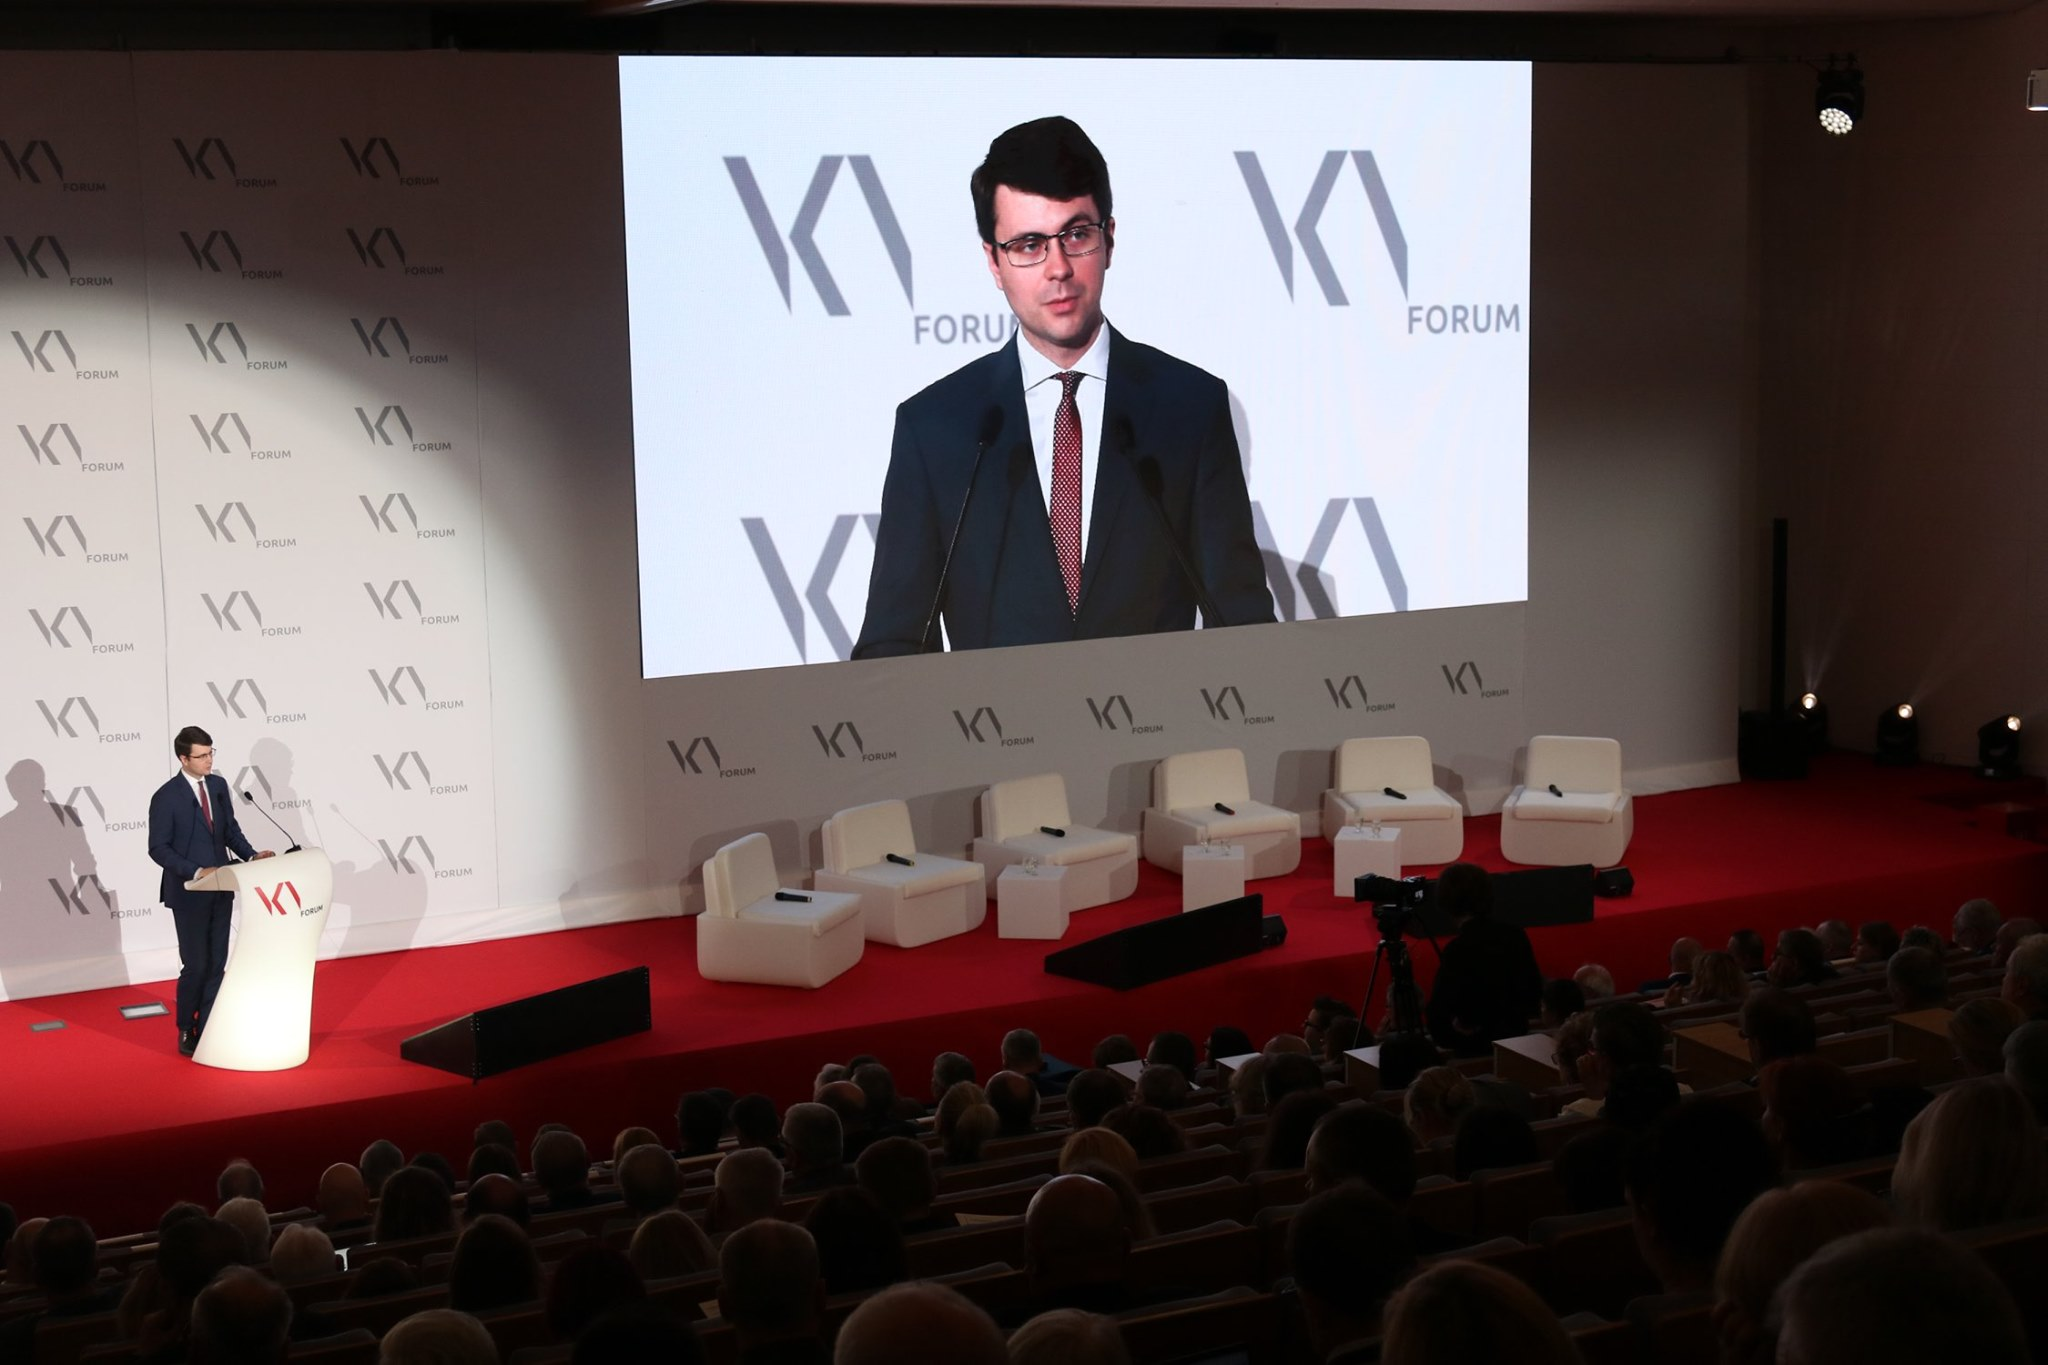 Debata NKN Forum